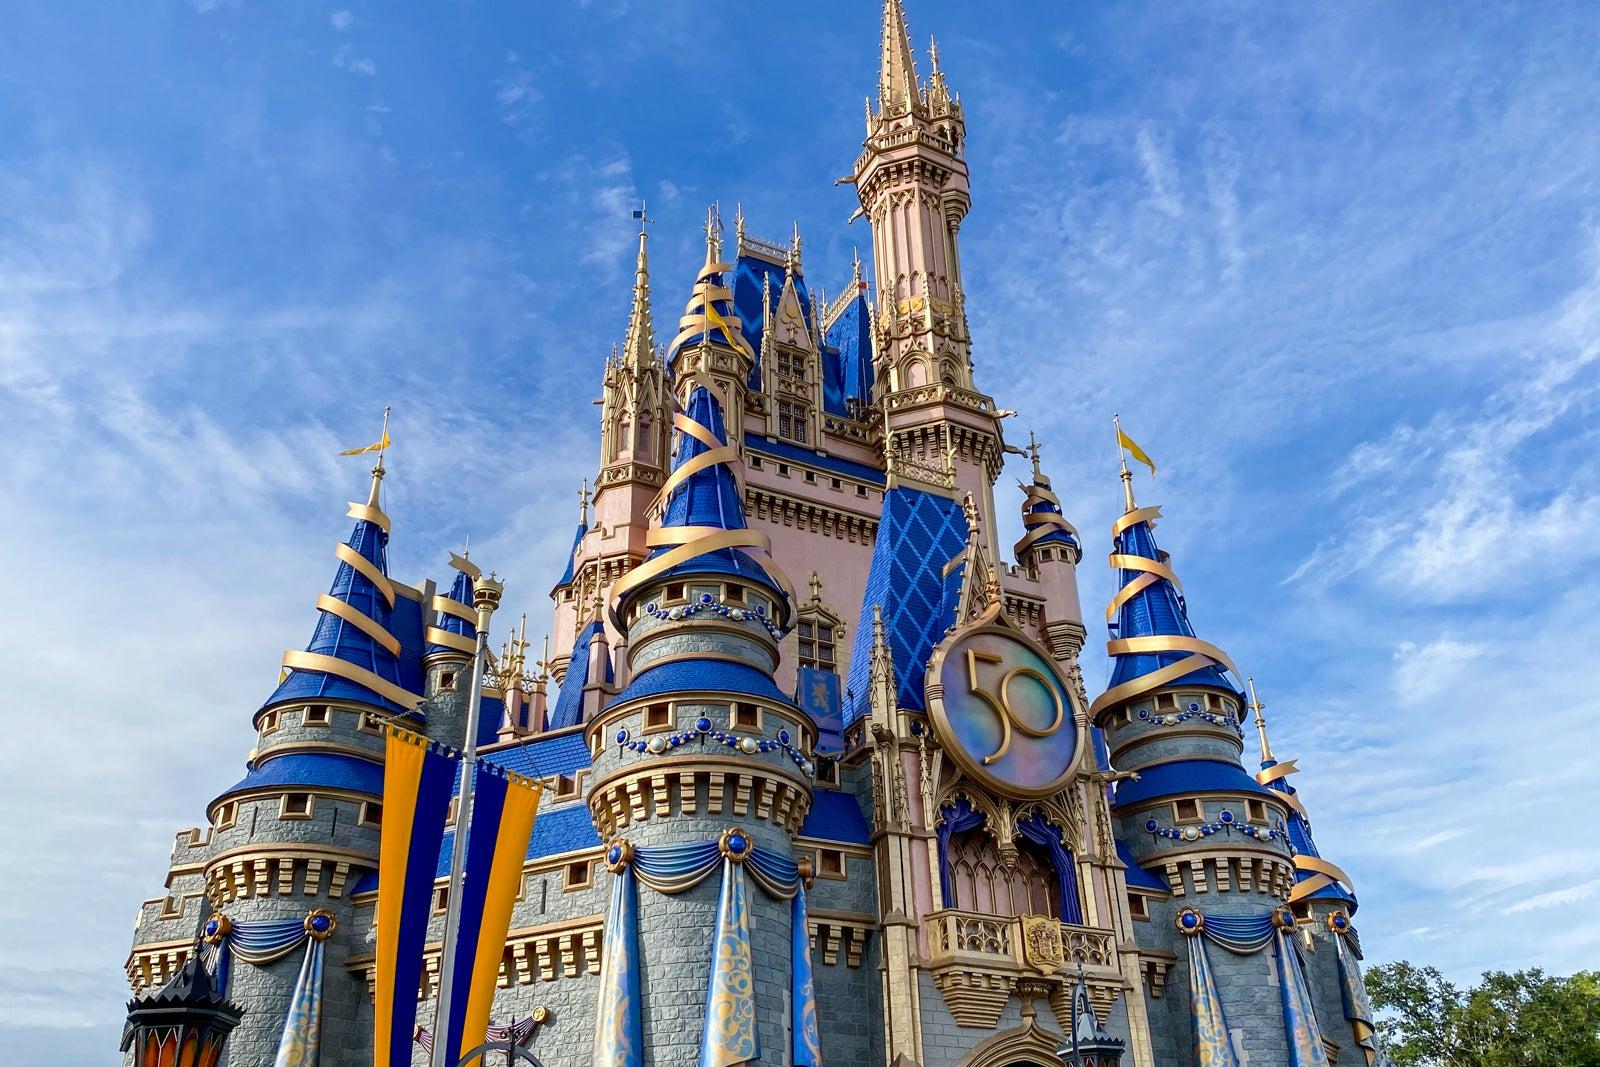 Disney World's paid 'FastPass' program called Genie+ launches Oct. 19